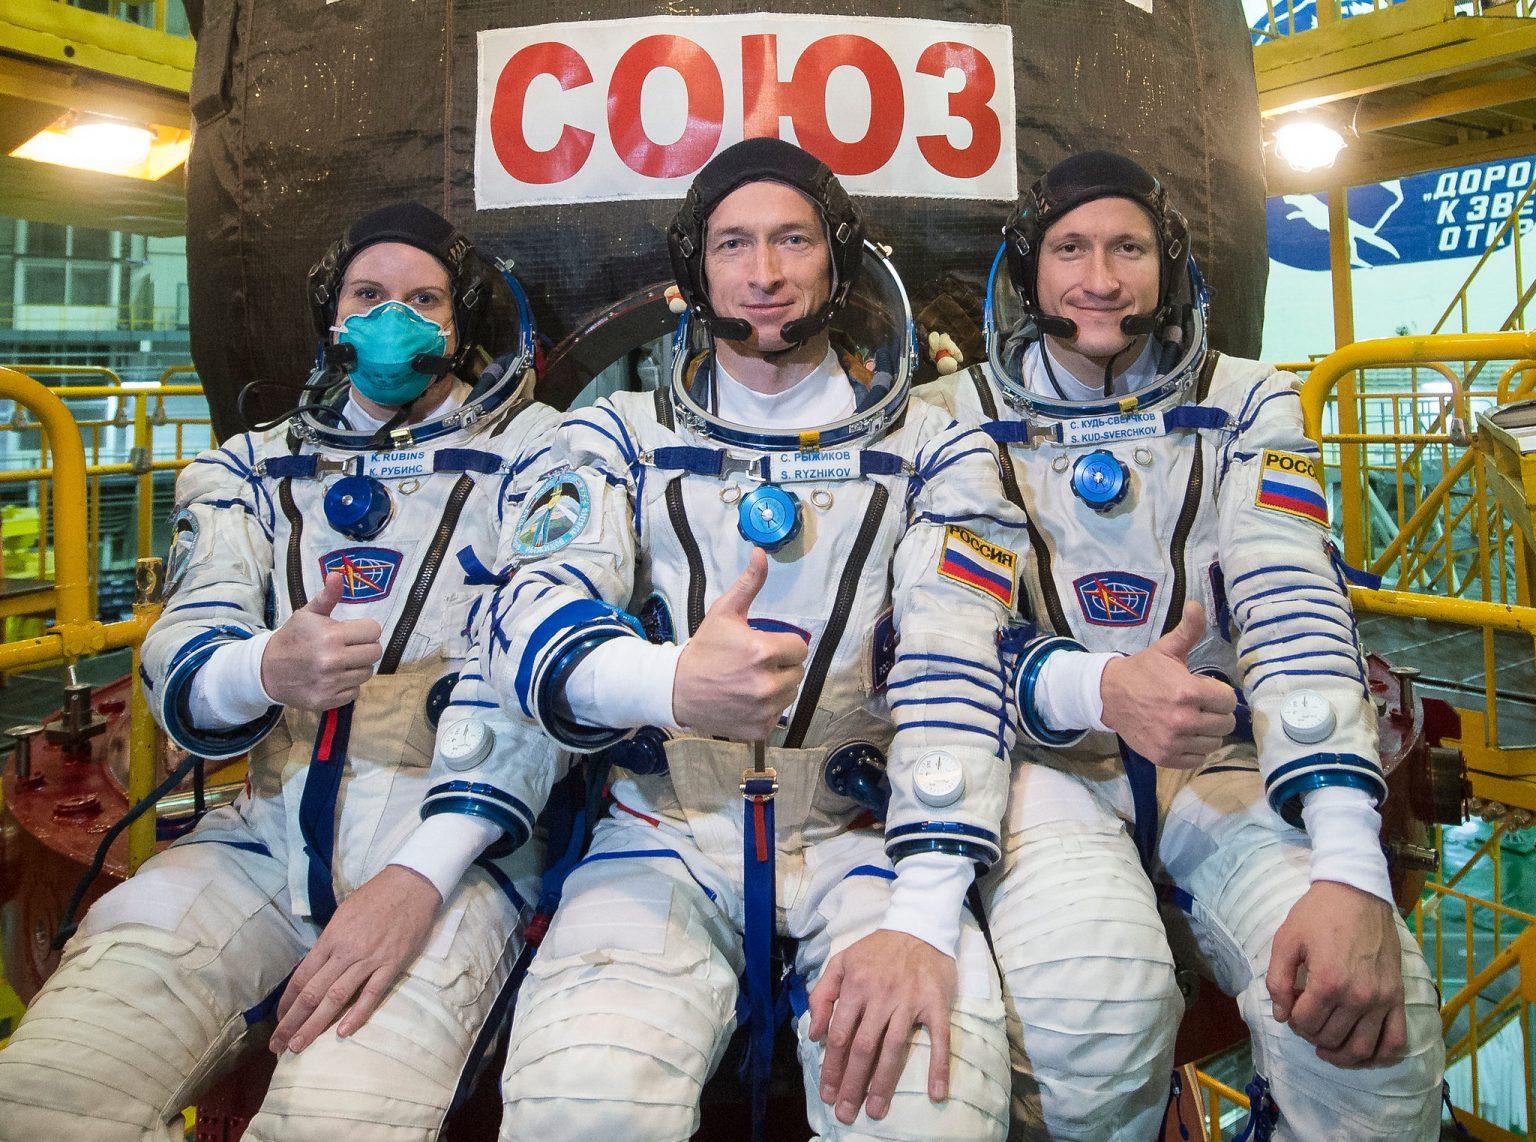 "NASA宇航员Kate Rubins、俄罗斯宇航员Sergey Ryzhikov和Sergey Kud-Sverchkov在""联盟MS-17""号飞船前(挨次从左去右)"